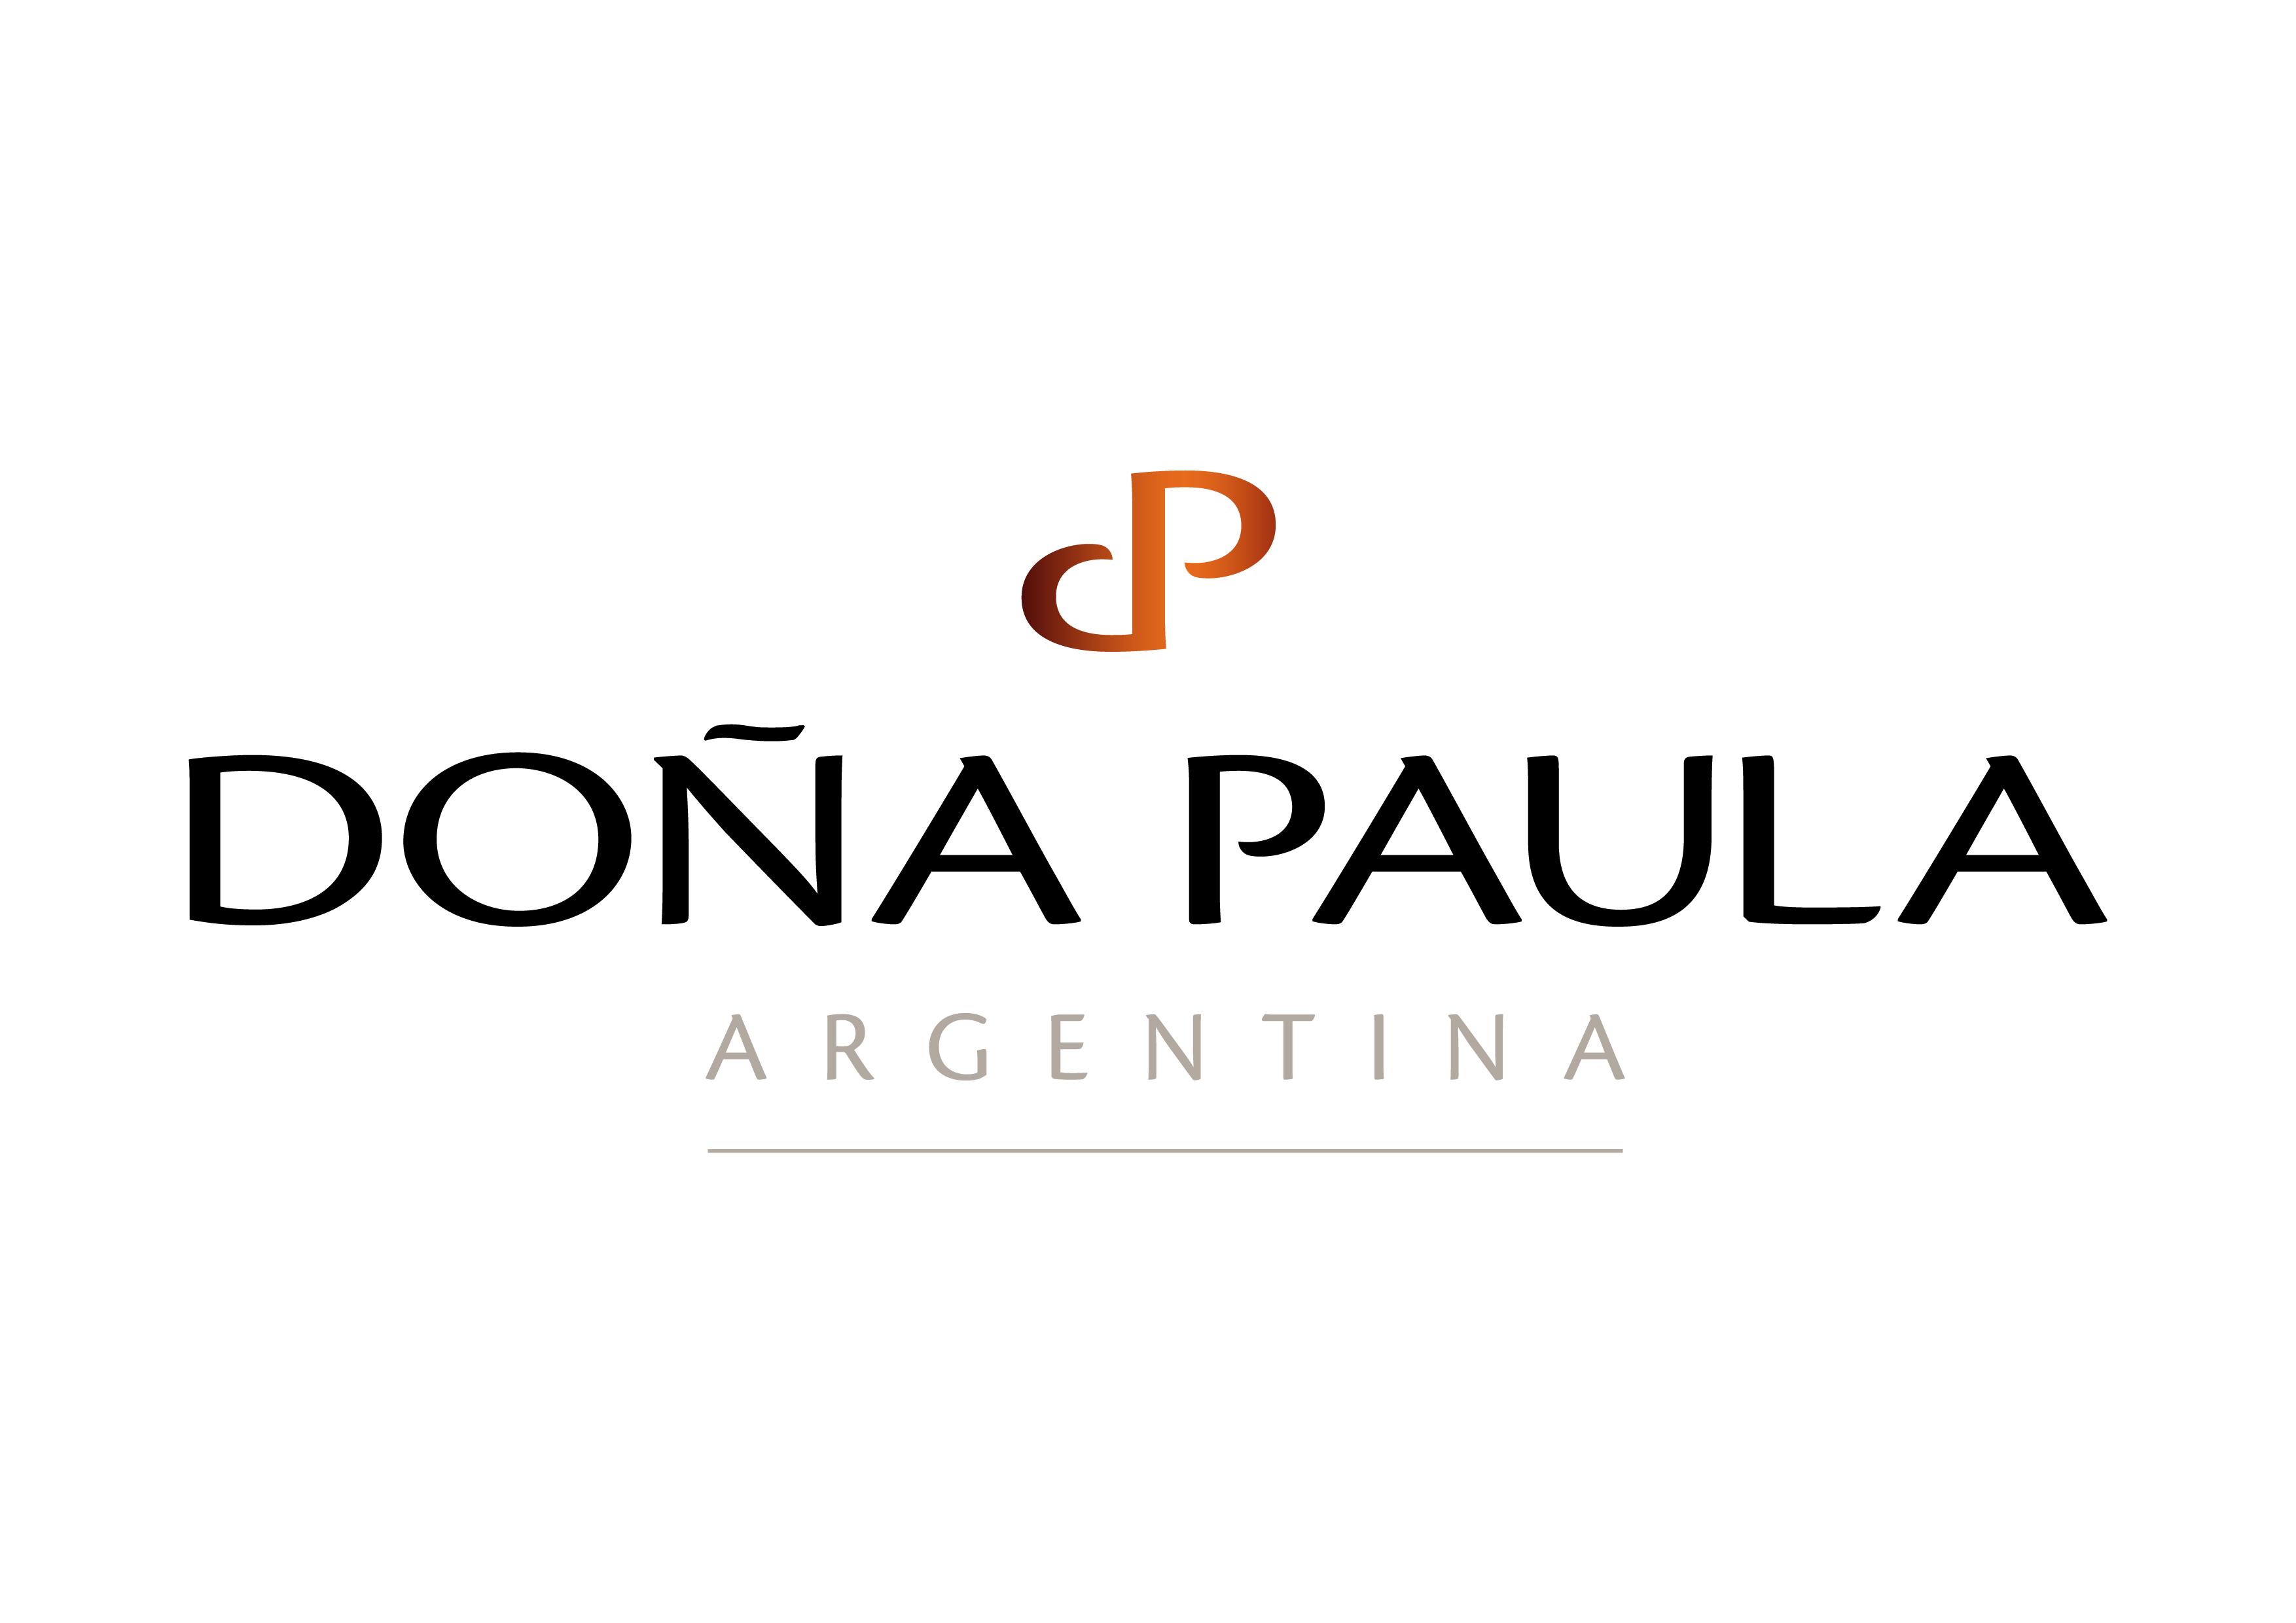 Doña Paula